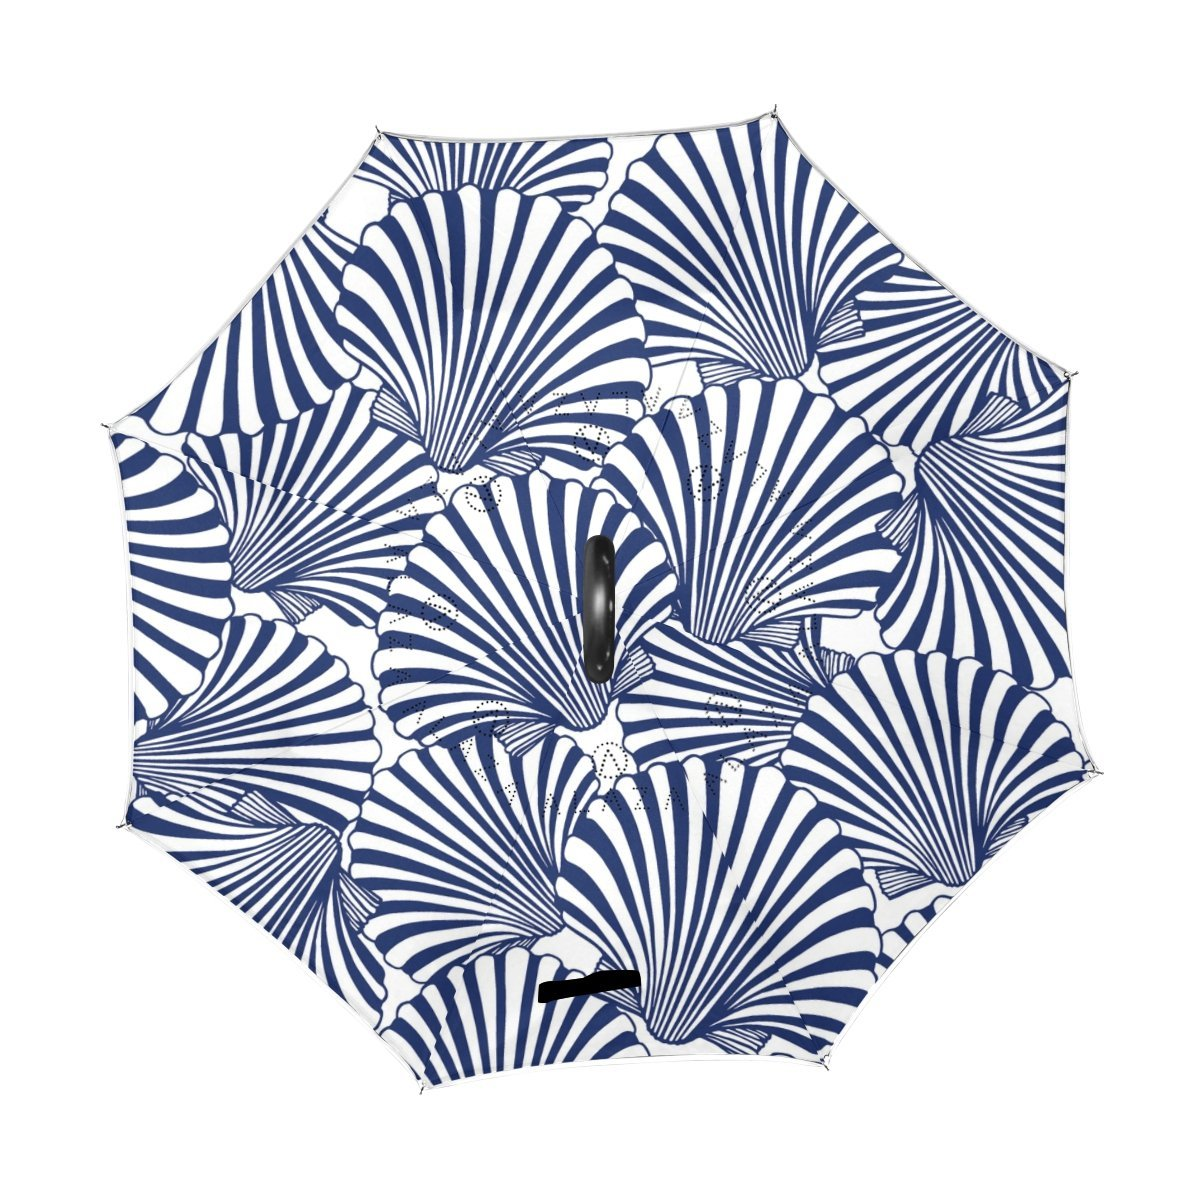 ef4e61d3c233 Cheap Striped Outdoor Umbrellas, find Striped Outdoor Umbrellas ...